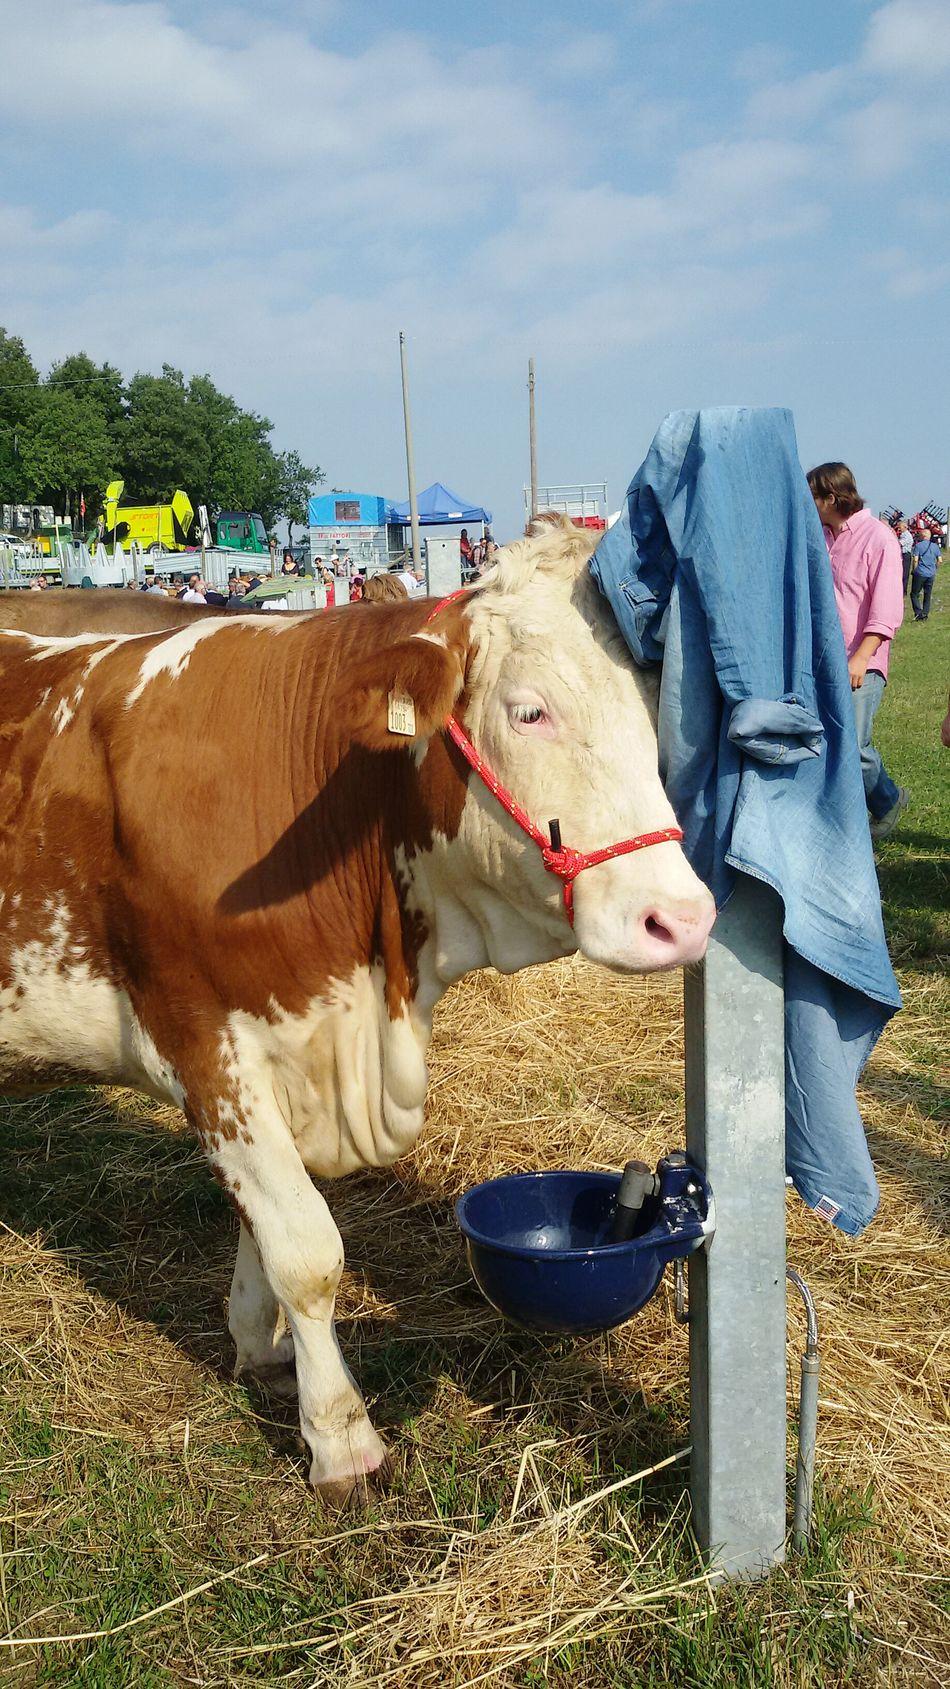 Herbivorous One Animal Animal Themes Animal Rural Scene Mucca